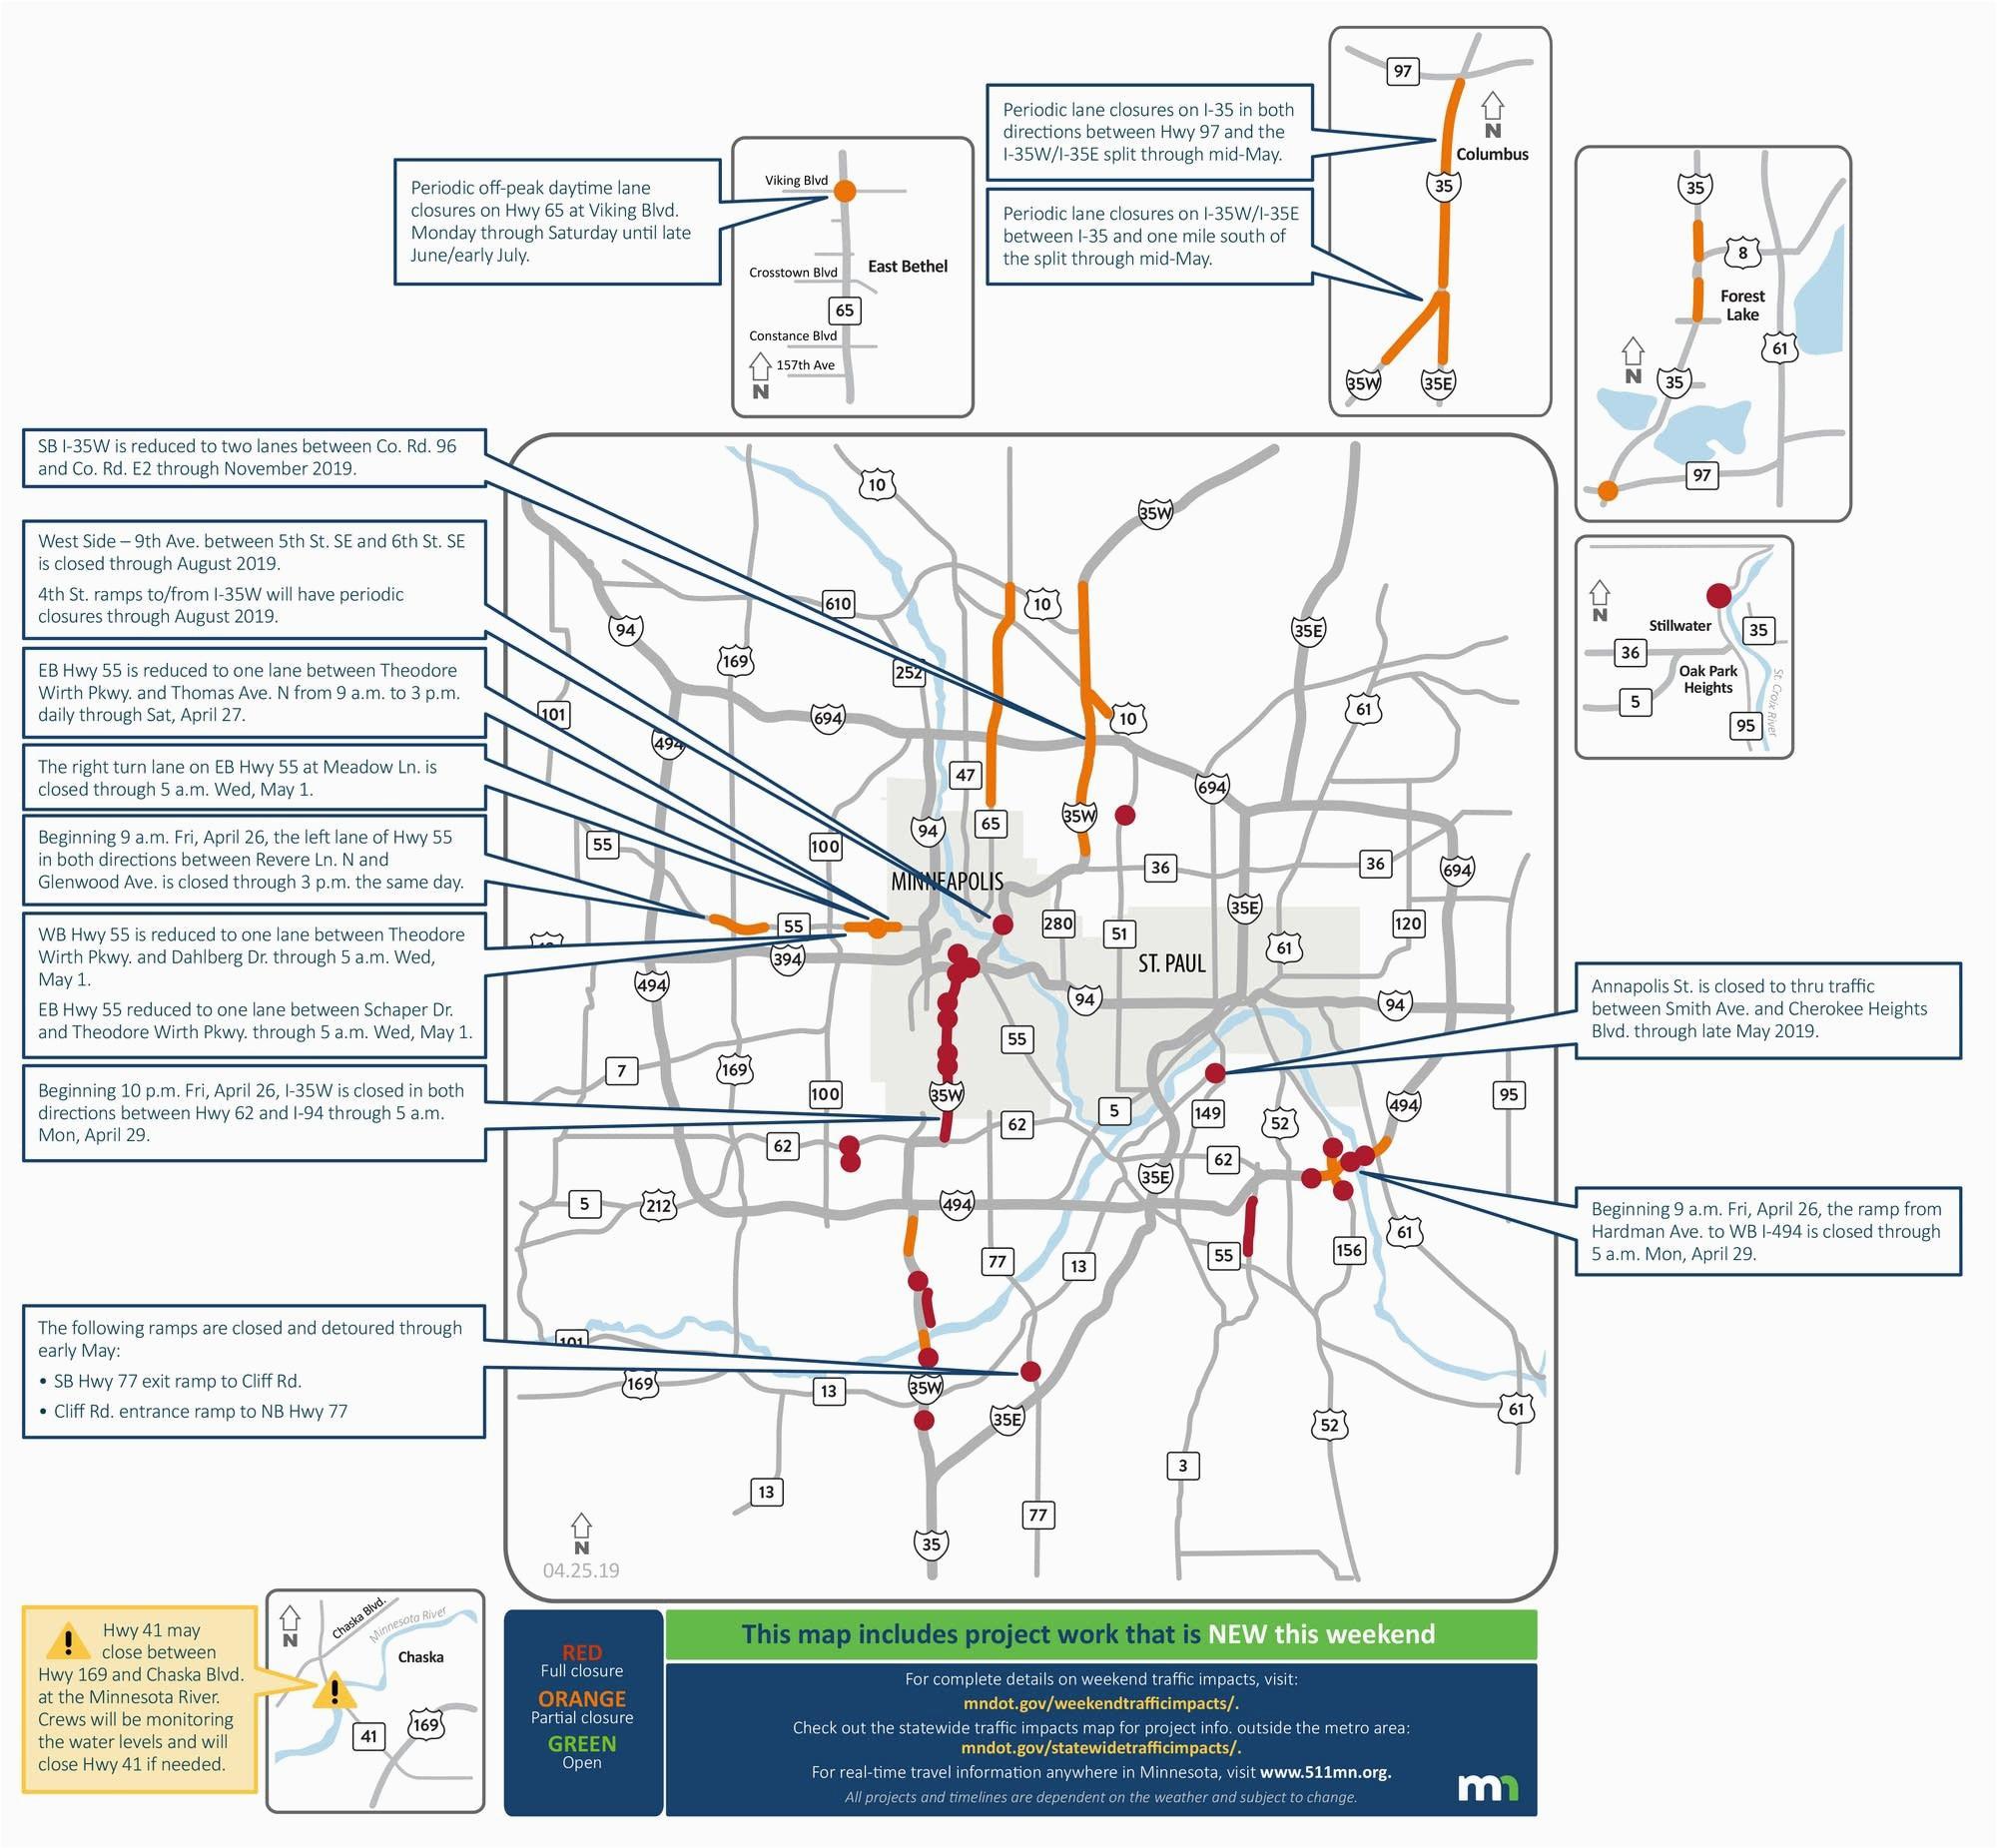 Minnesota Road Conditions Map Minnesota Road Conditions Map | secretmuseum